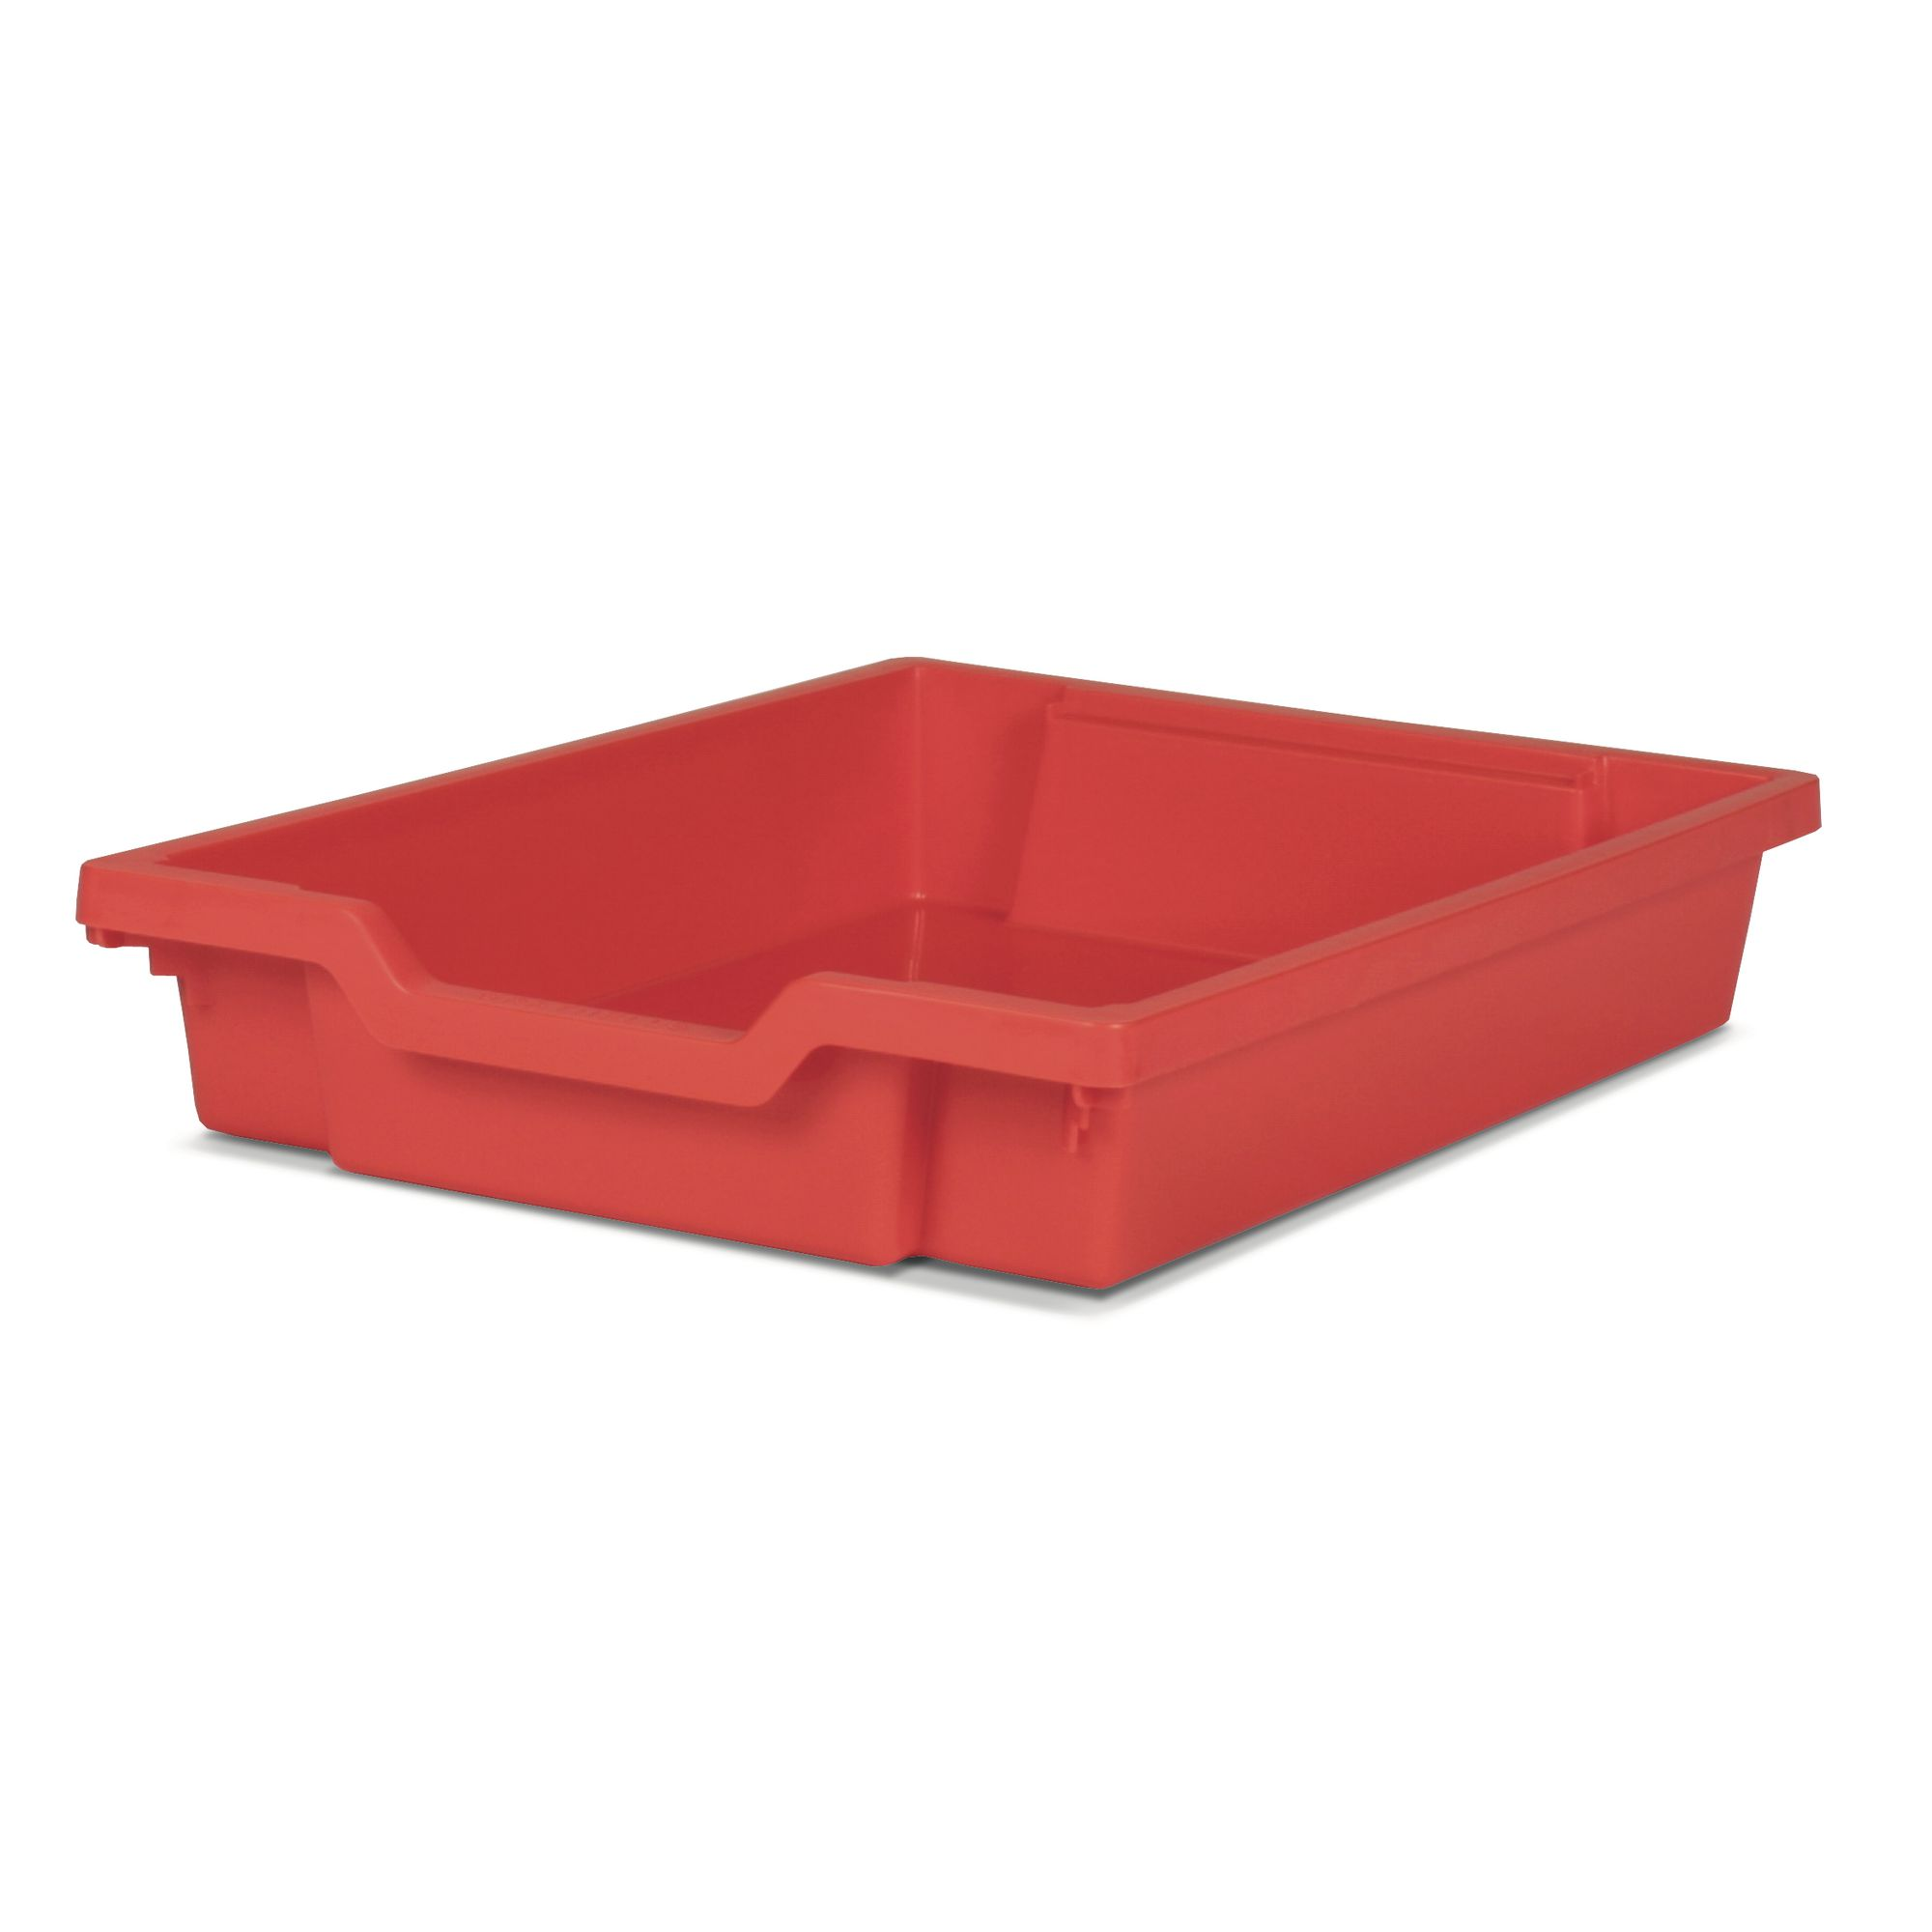 Gratnells Shallow Storage Tray Red Philip Harris